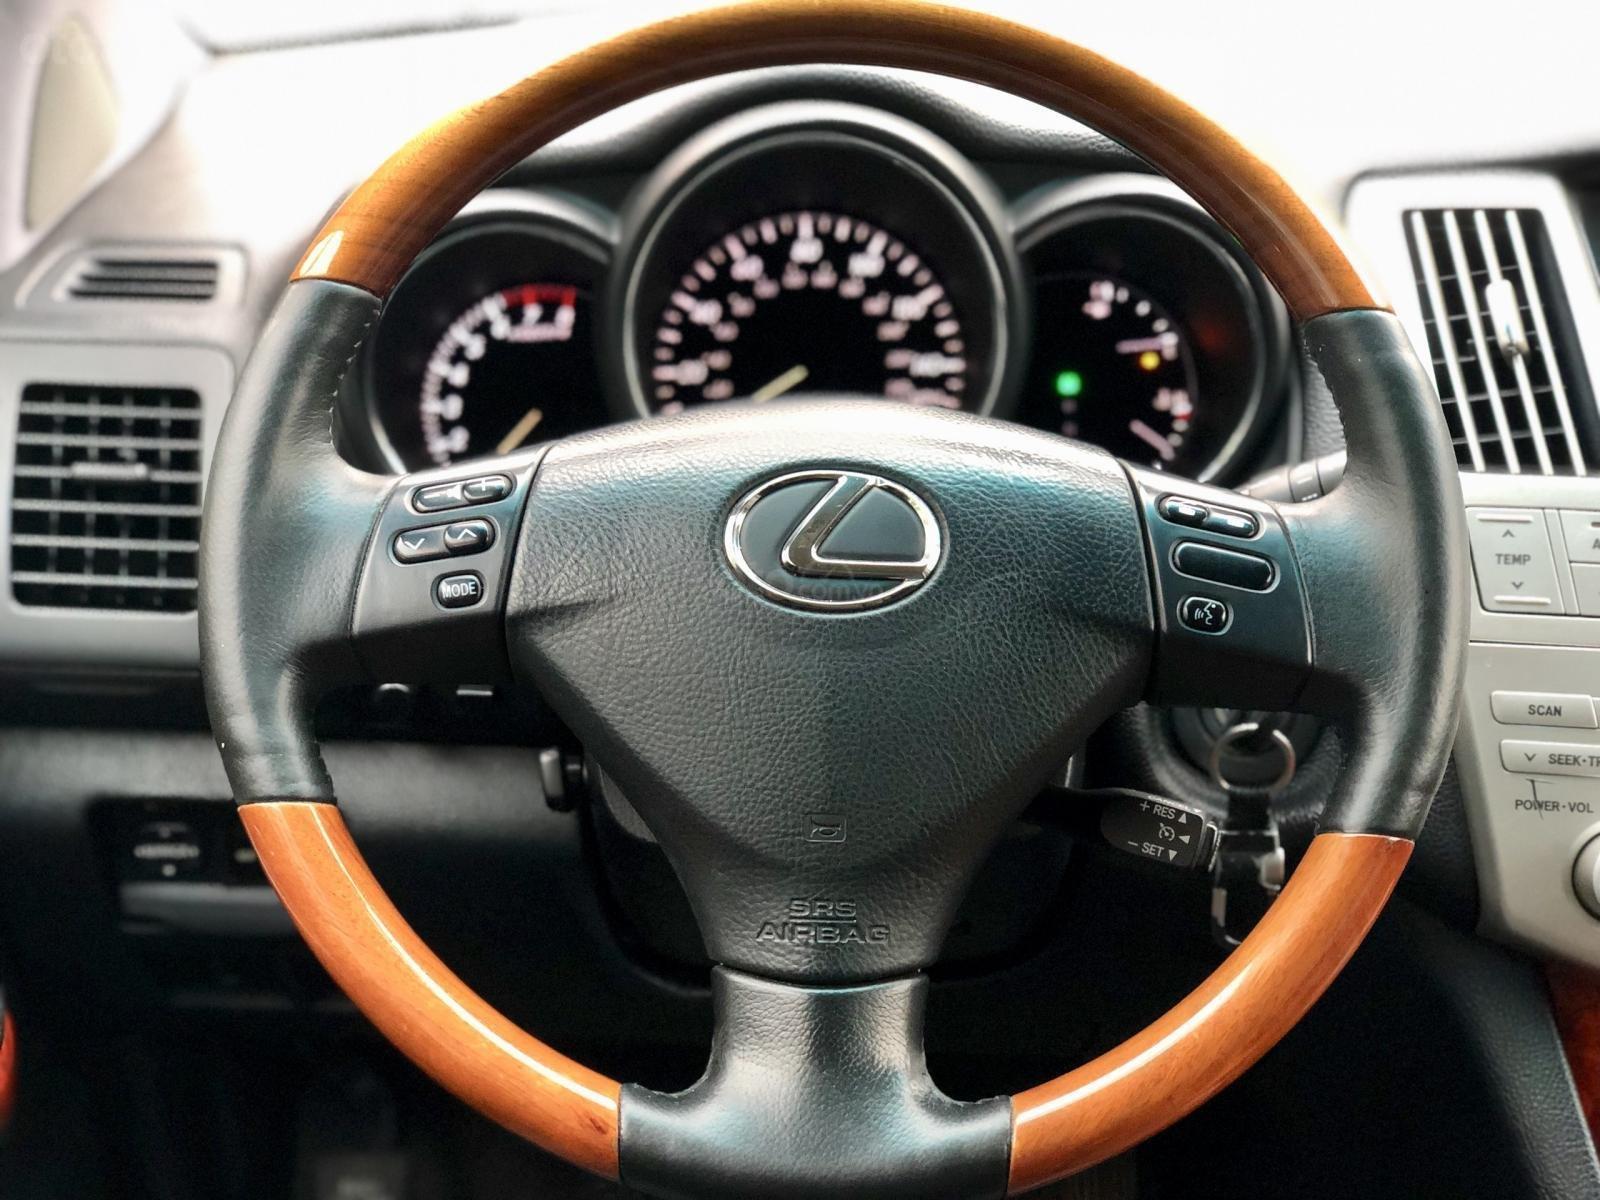 MT Auto bán Lexus RX 350 năm 2007, màu đen, xe nhập khẩu. LH em Hương 0945392468-10